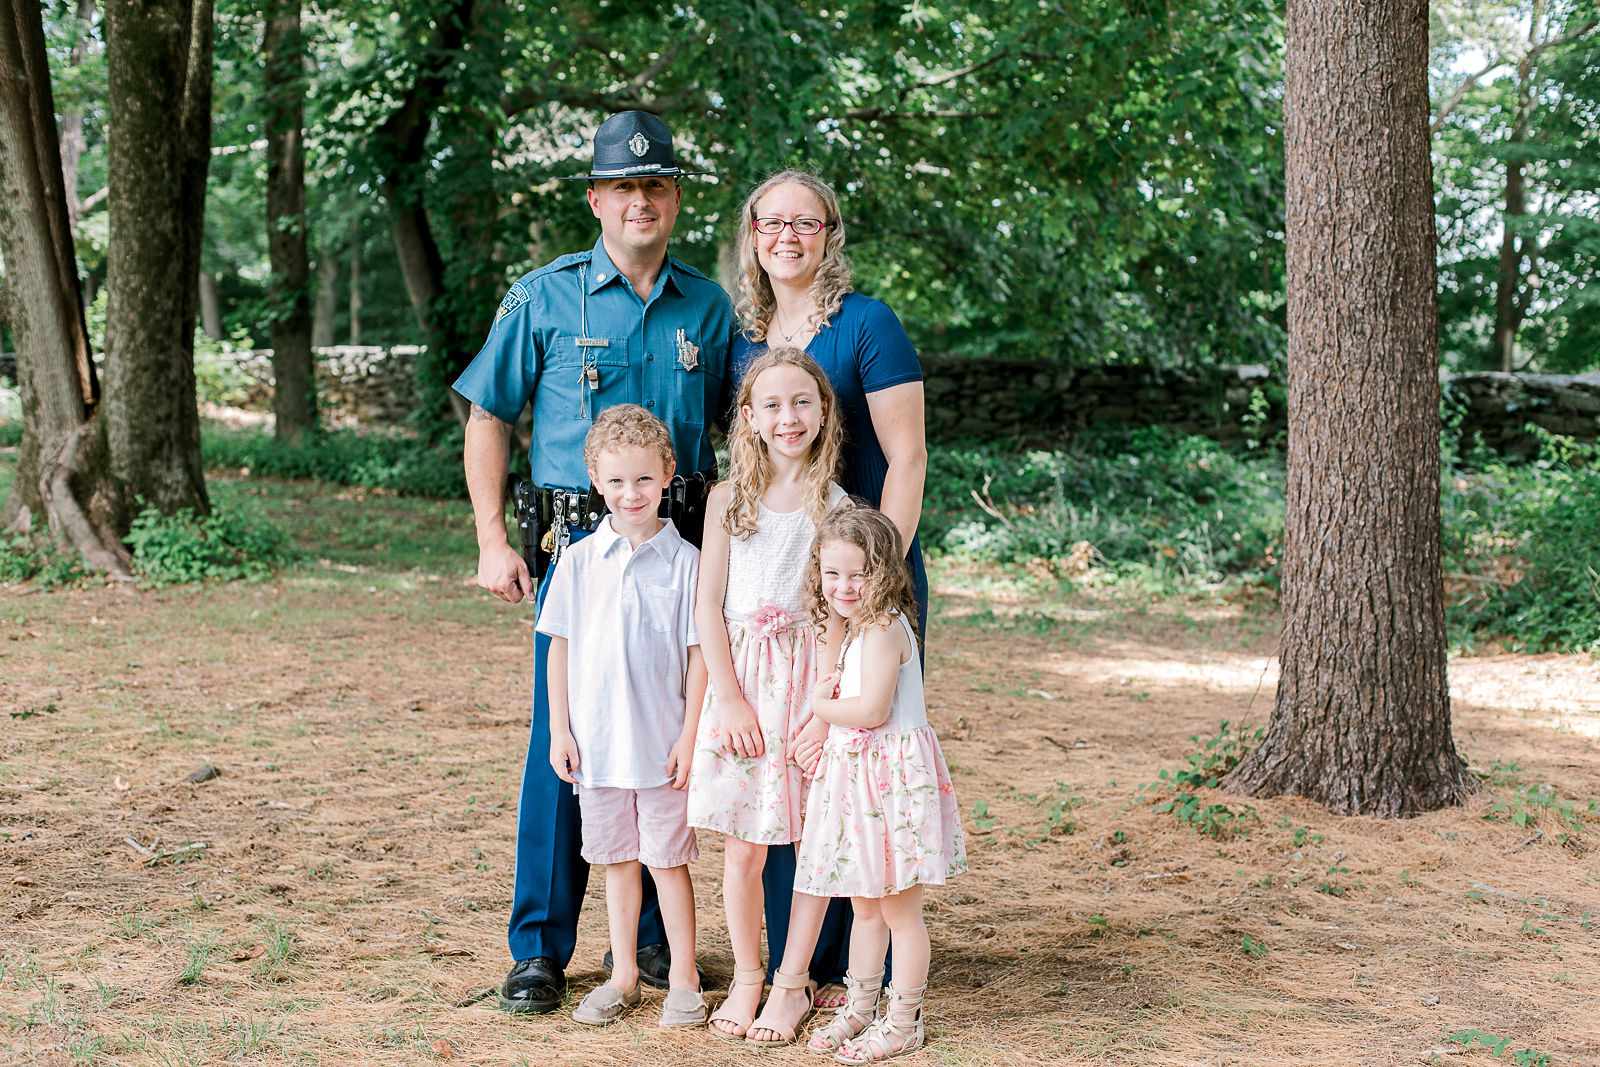 public_safety_family_photos_goddard_park_warwick_RI_erica_pezente_photography(24).jpg